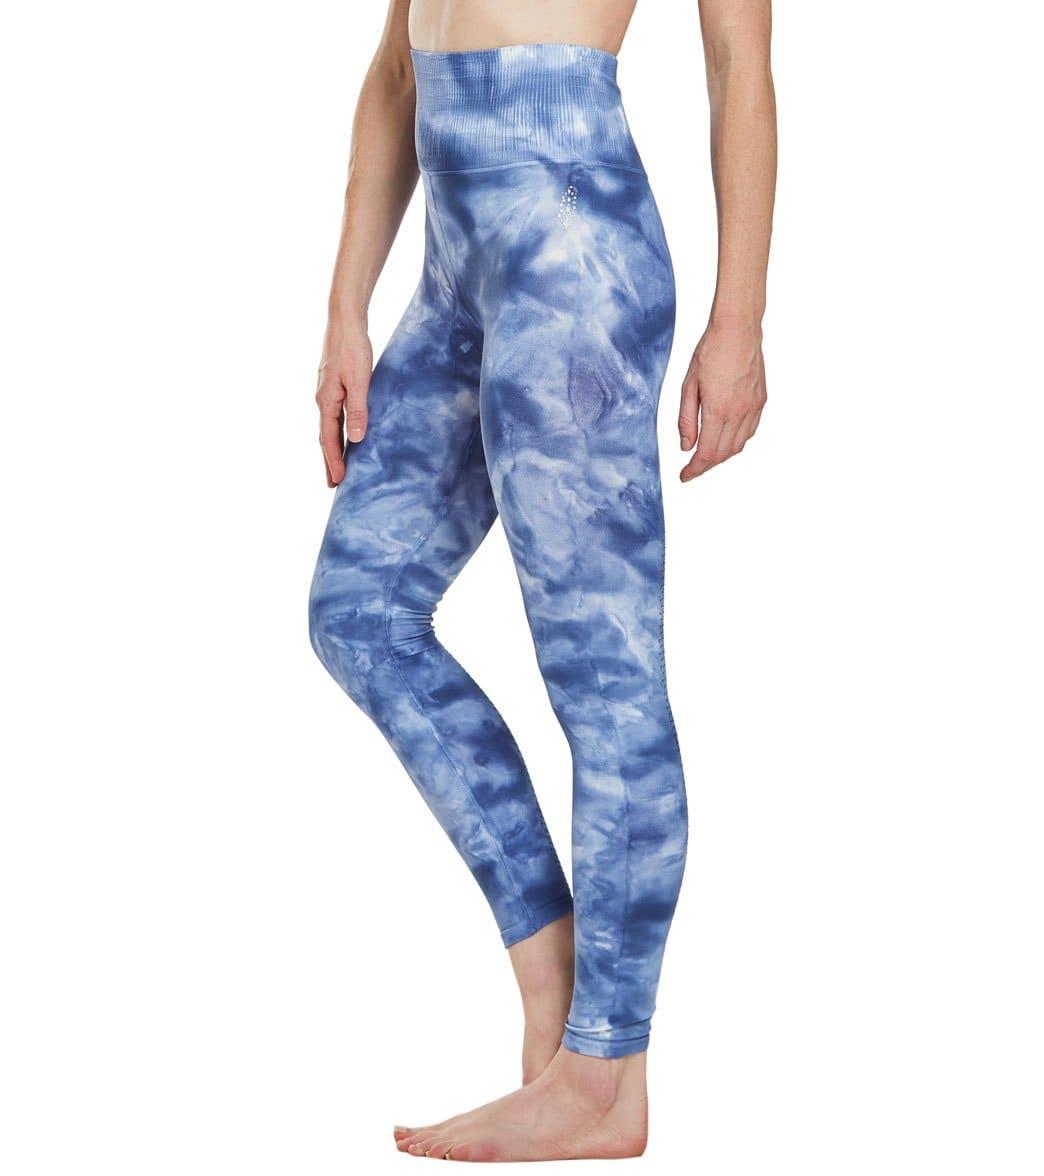 f675109f3a62 Free People Shanti Tie Dye Yoga Leggings at YogaOutlet.com - Free ...